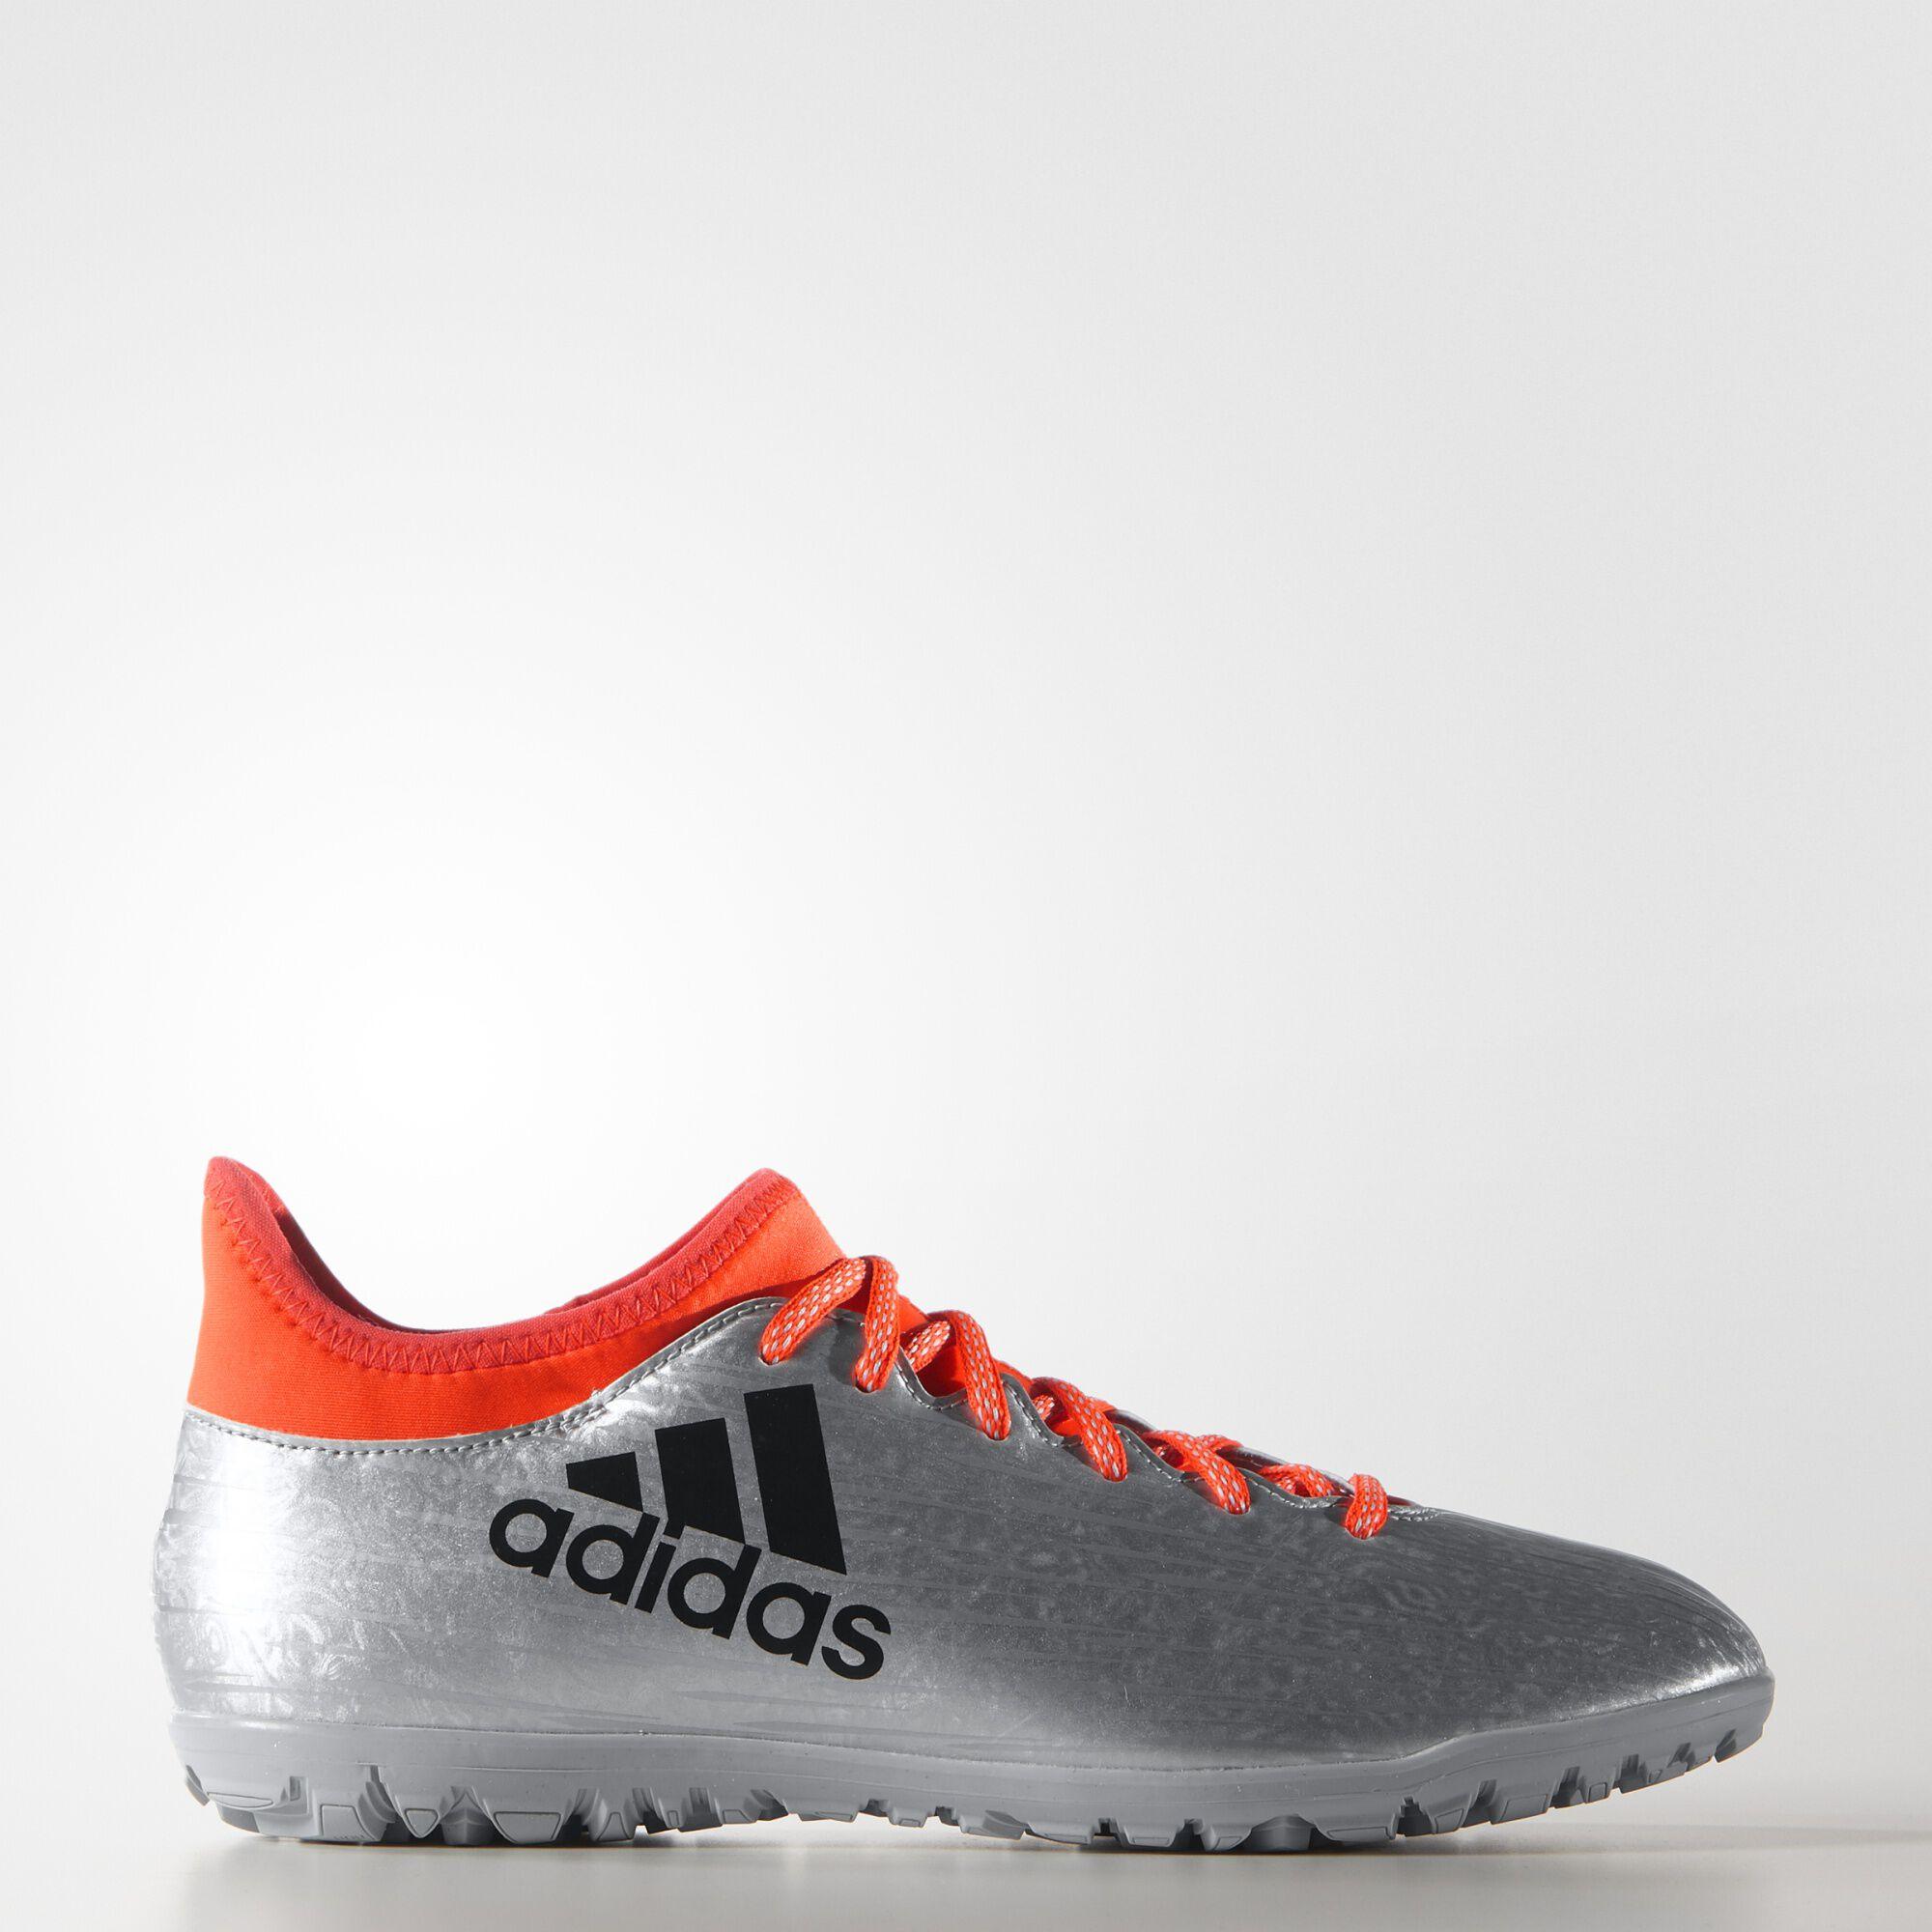 9e702bf0230d3 tenis-adidas-futbol-754401-MLM20339086404 072015-F square false zapatos  adidas turf